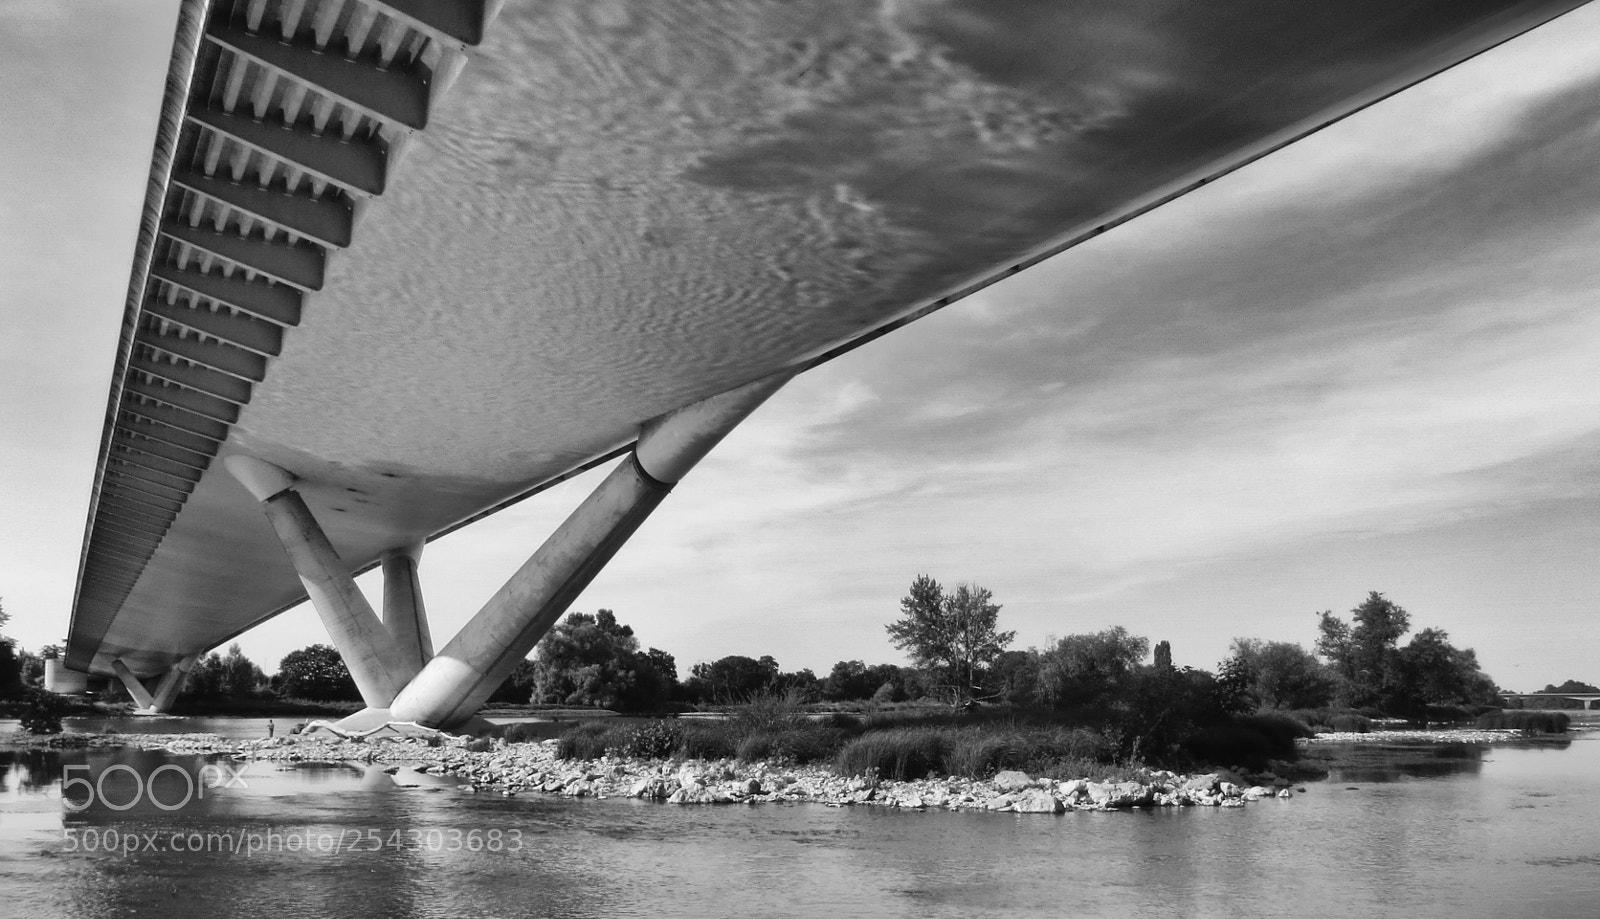 Europa Bridge, Canon POWERSHOT SX240 HS